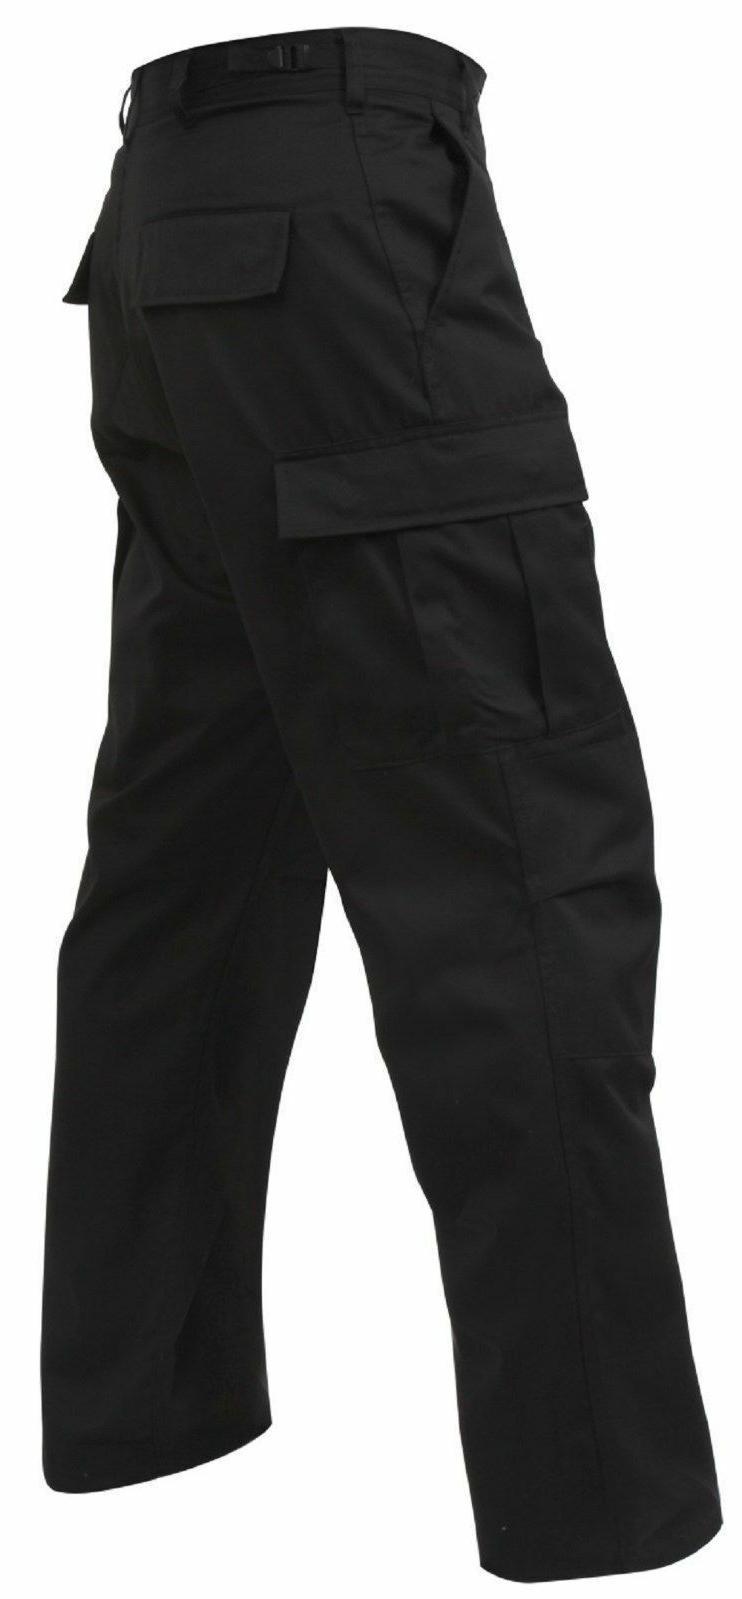 BLACK 5923 PANTS CARGO SECURITY XS